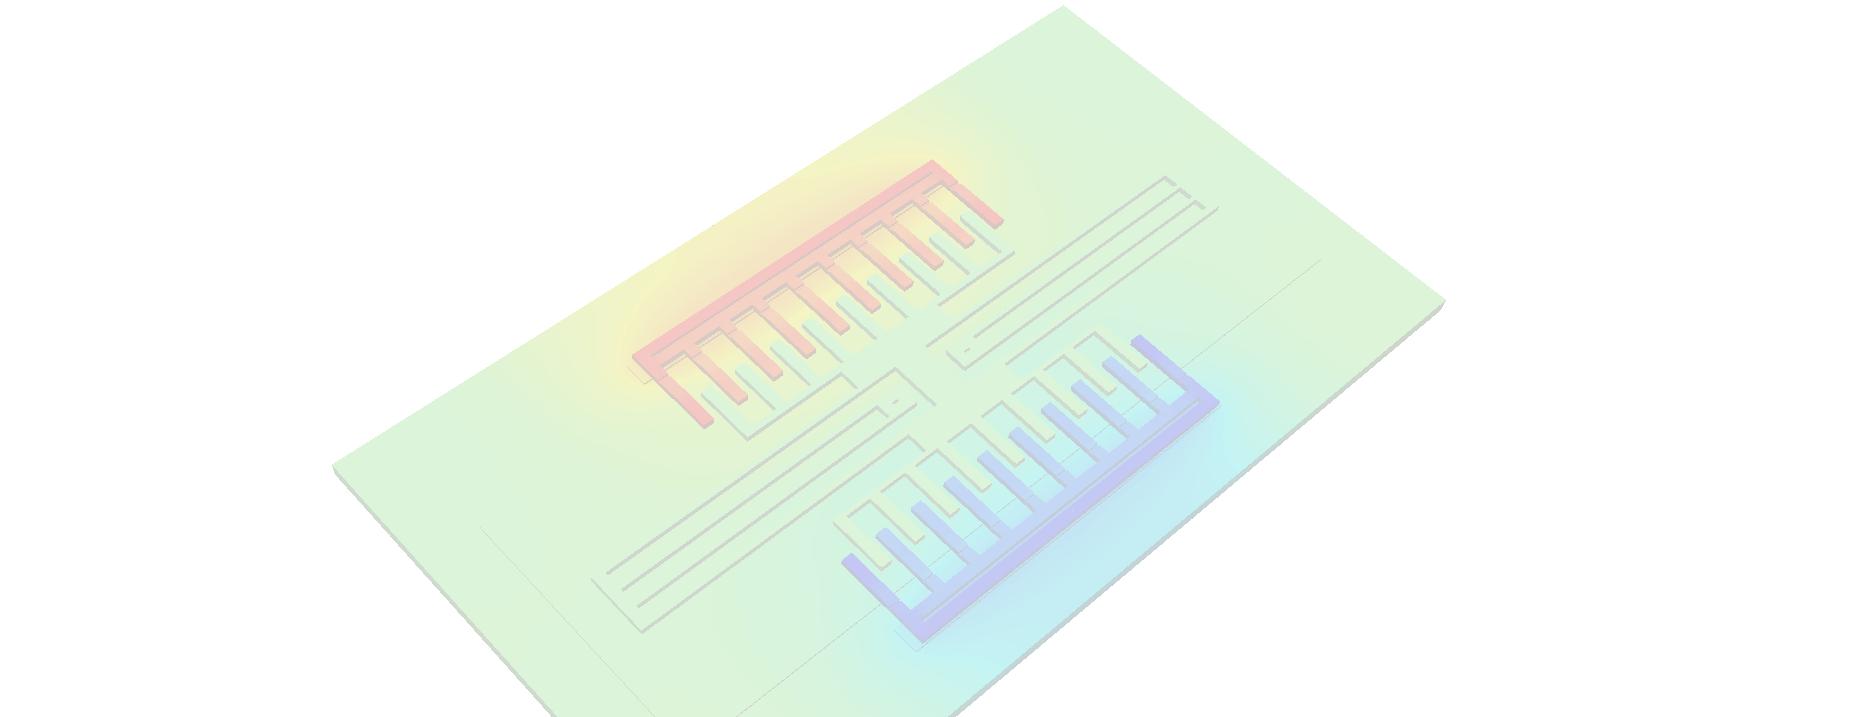 onscale softmems mentor resonator simulation image